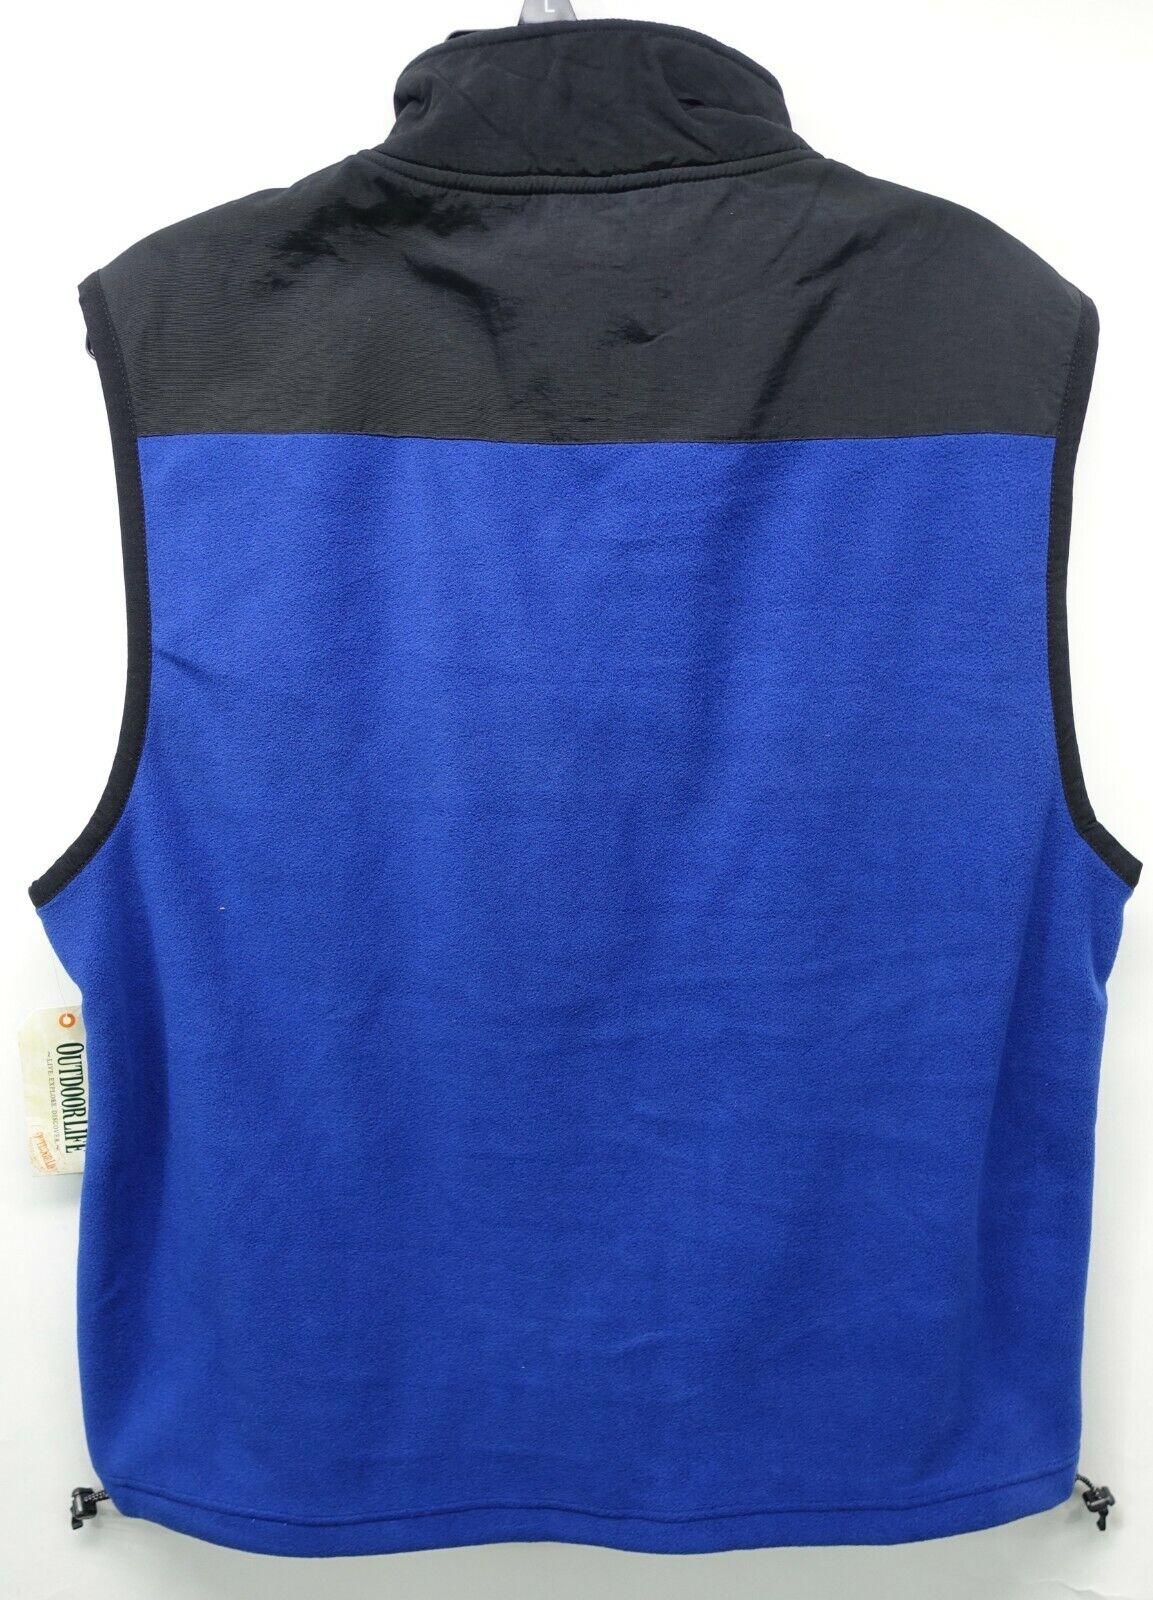 Outdoor Life Zipper Front Vest Mens Large Blue Black